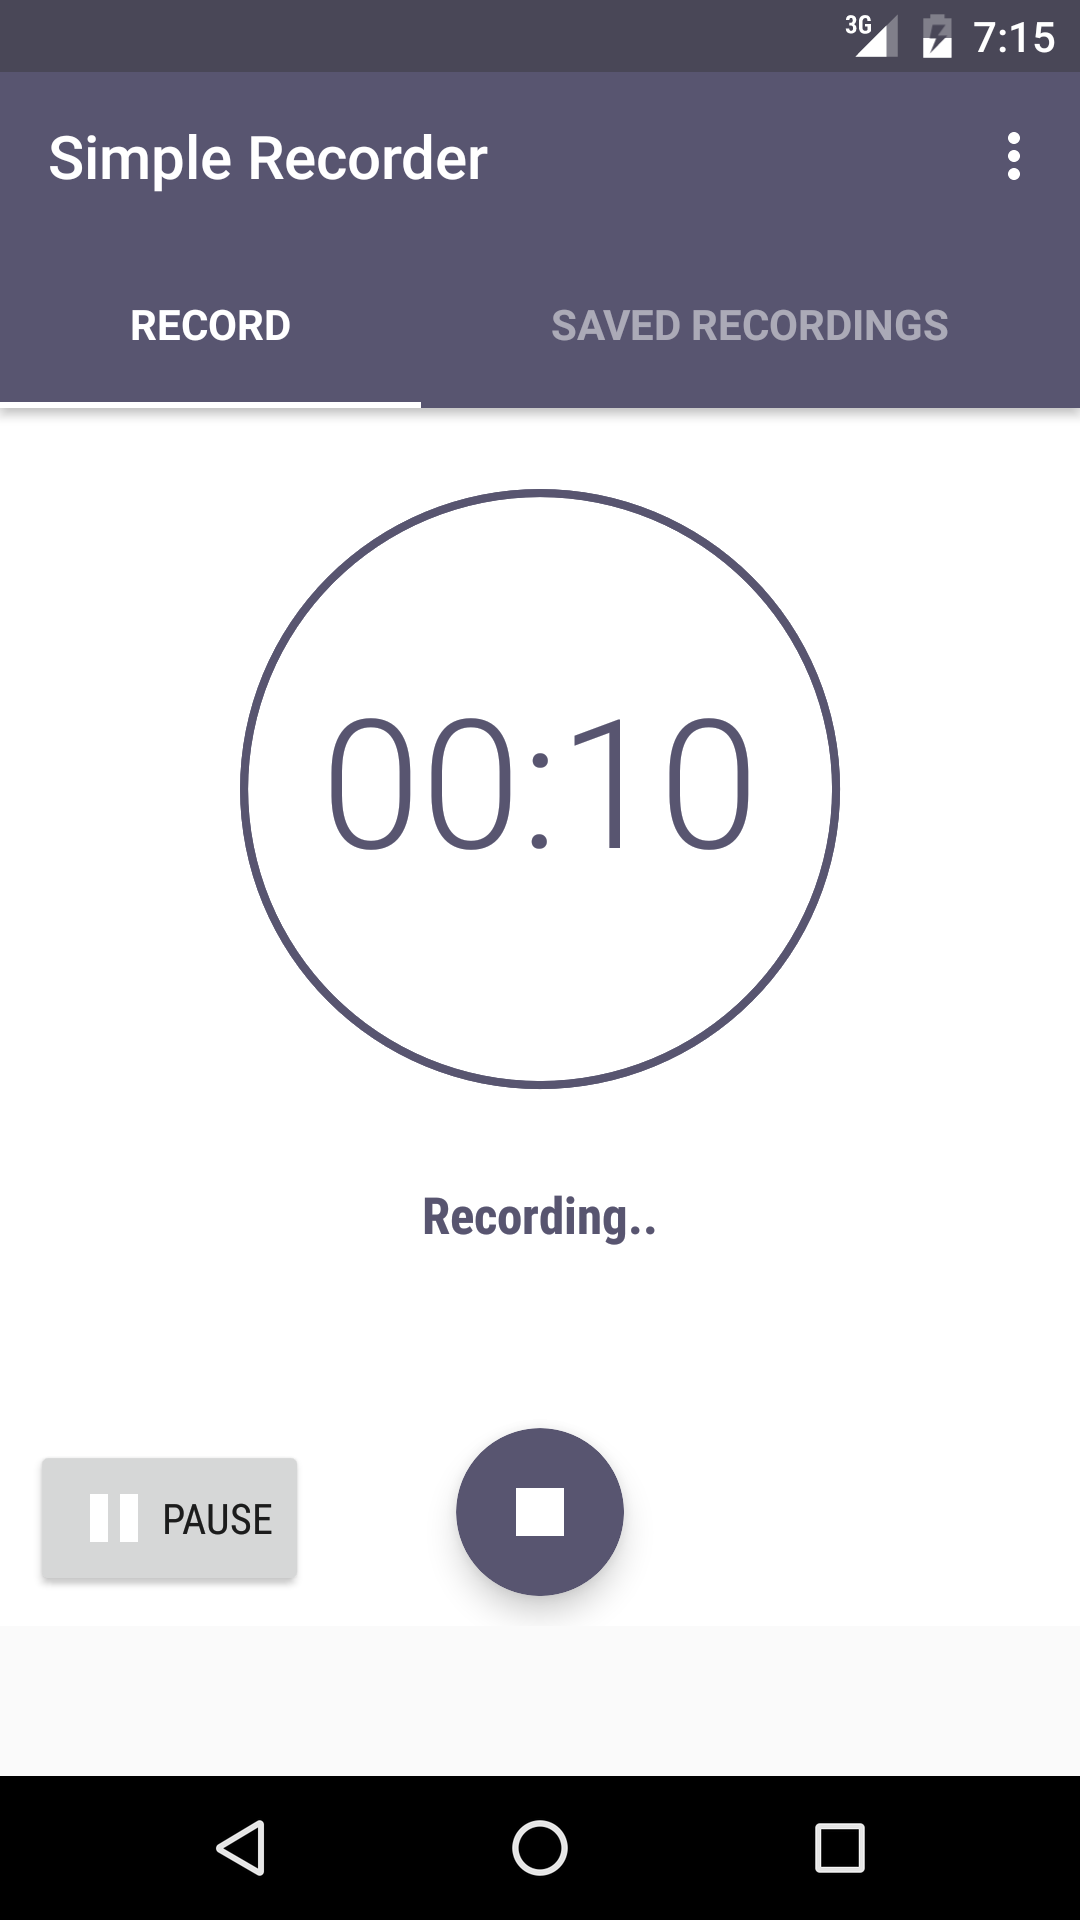 Simple Recorder